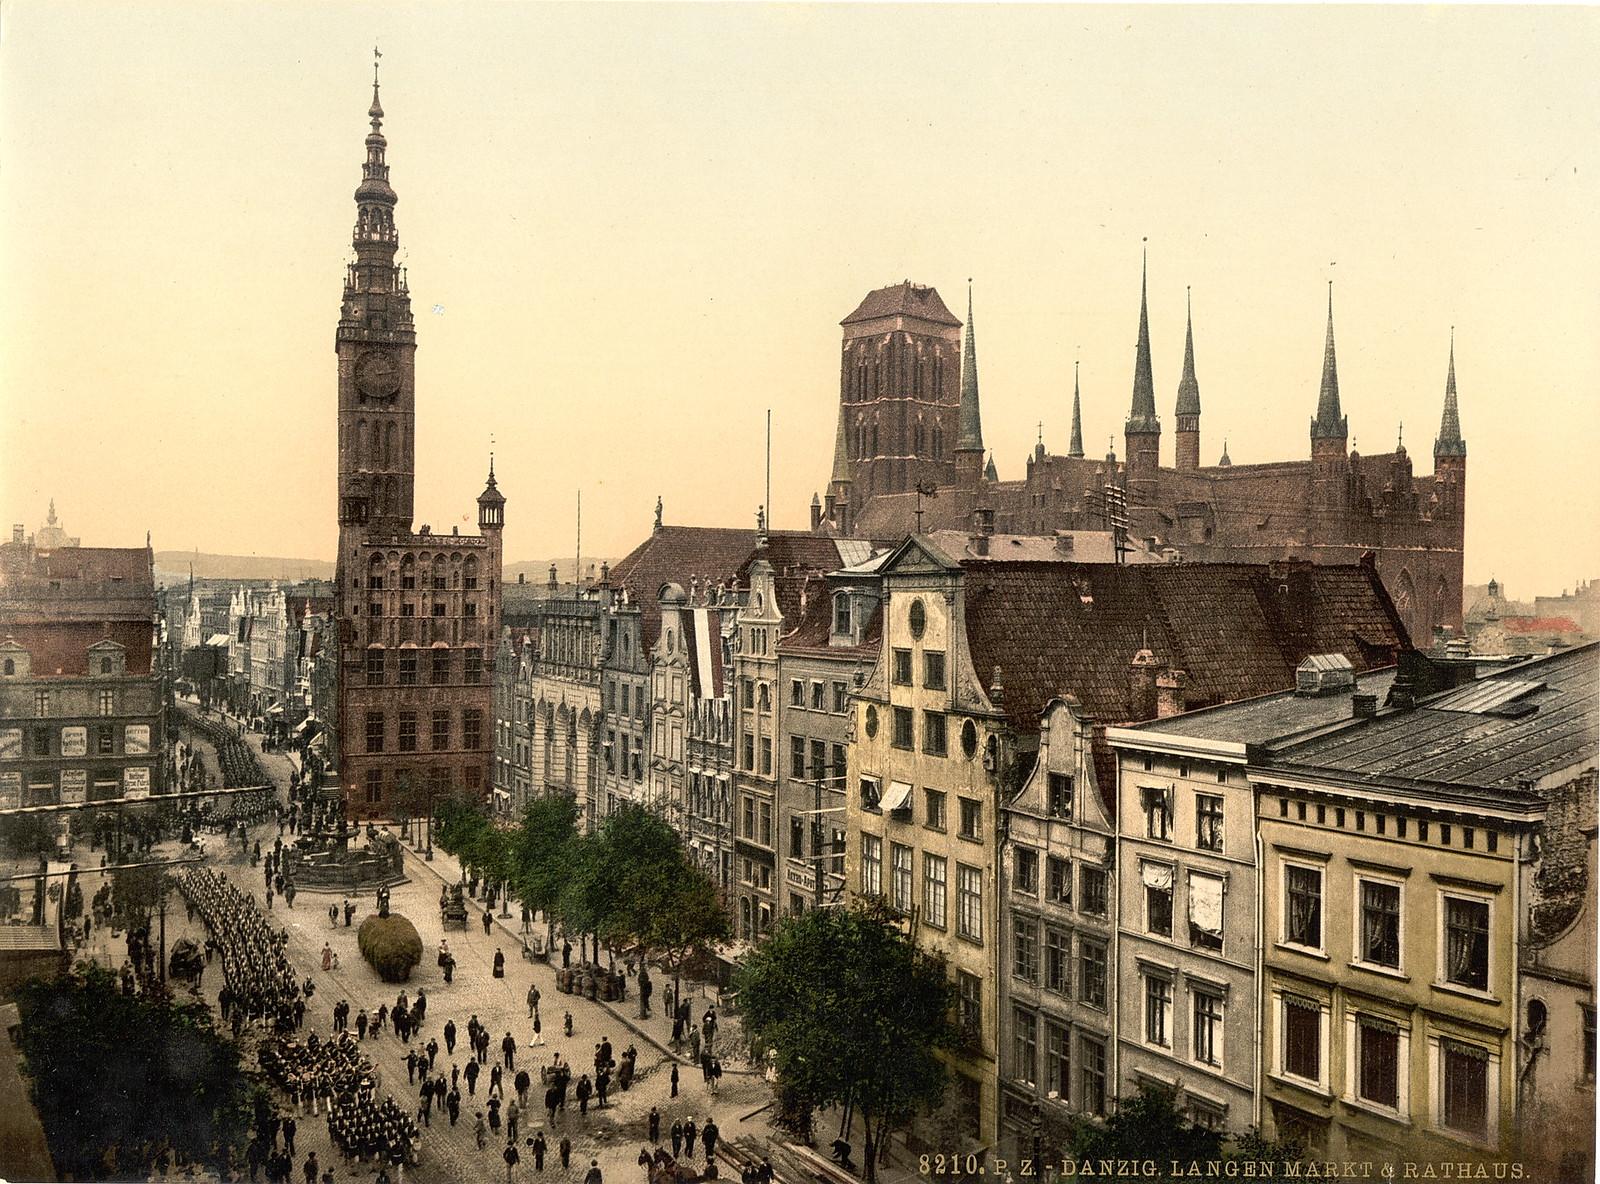 Danzig. Langen markt & rathaus. 1895-1900